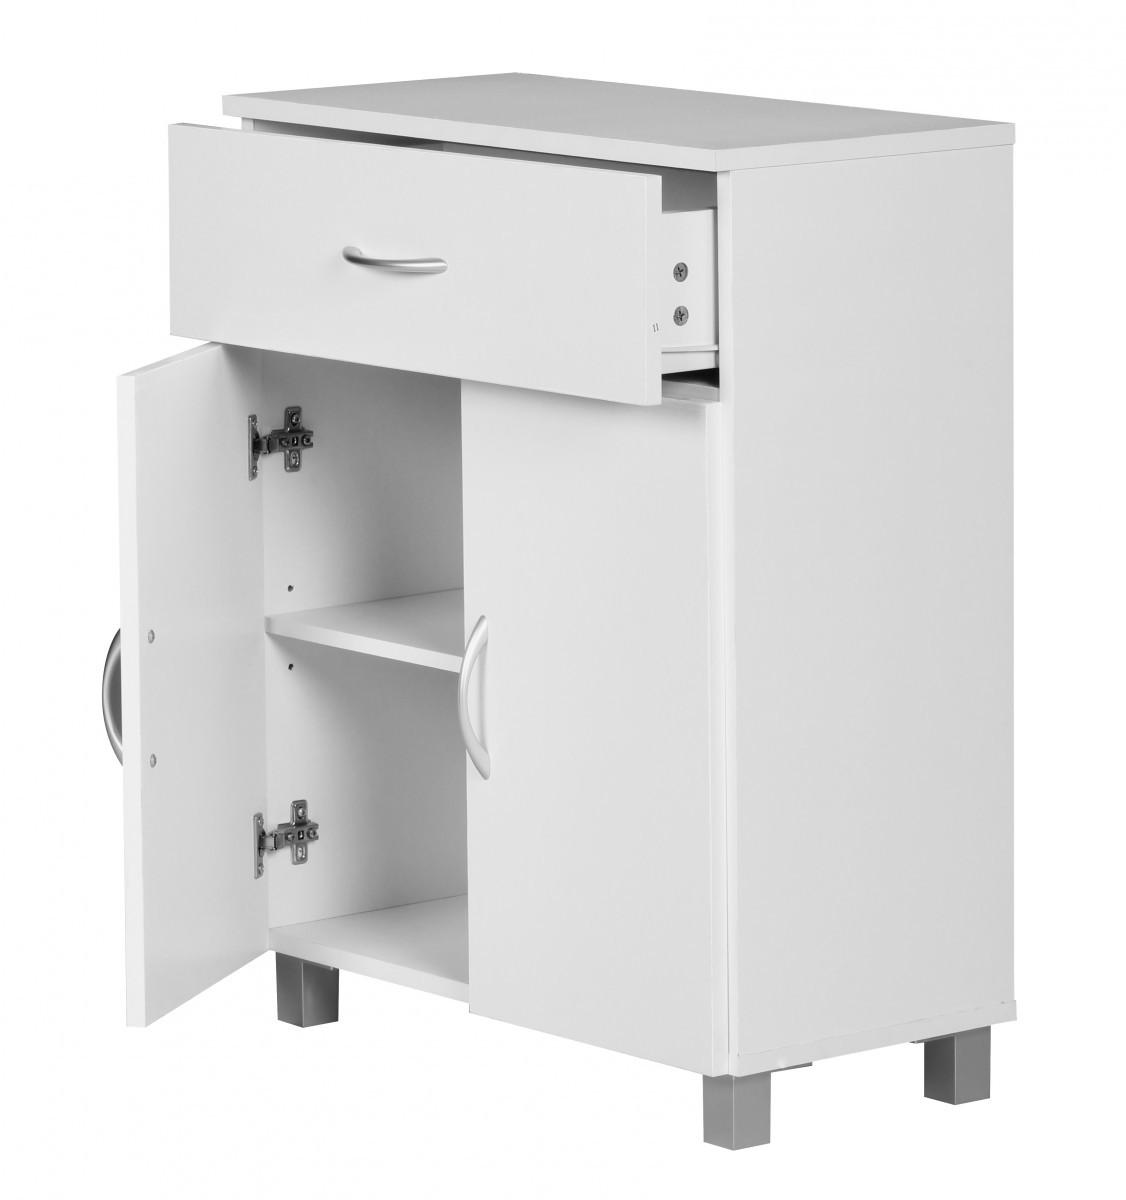 sideboard kommode anrichte regal schrank 60 x 75 cm 2 t ren 1 schublade flur ebay. Black Bedroom Furniture Sets. Home Design Ideas